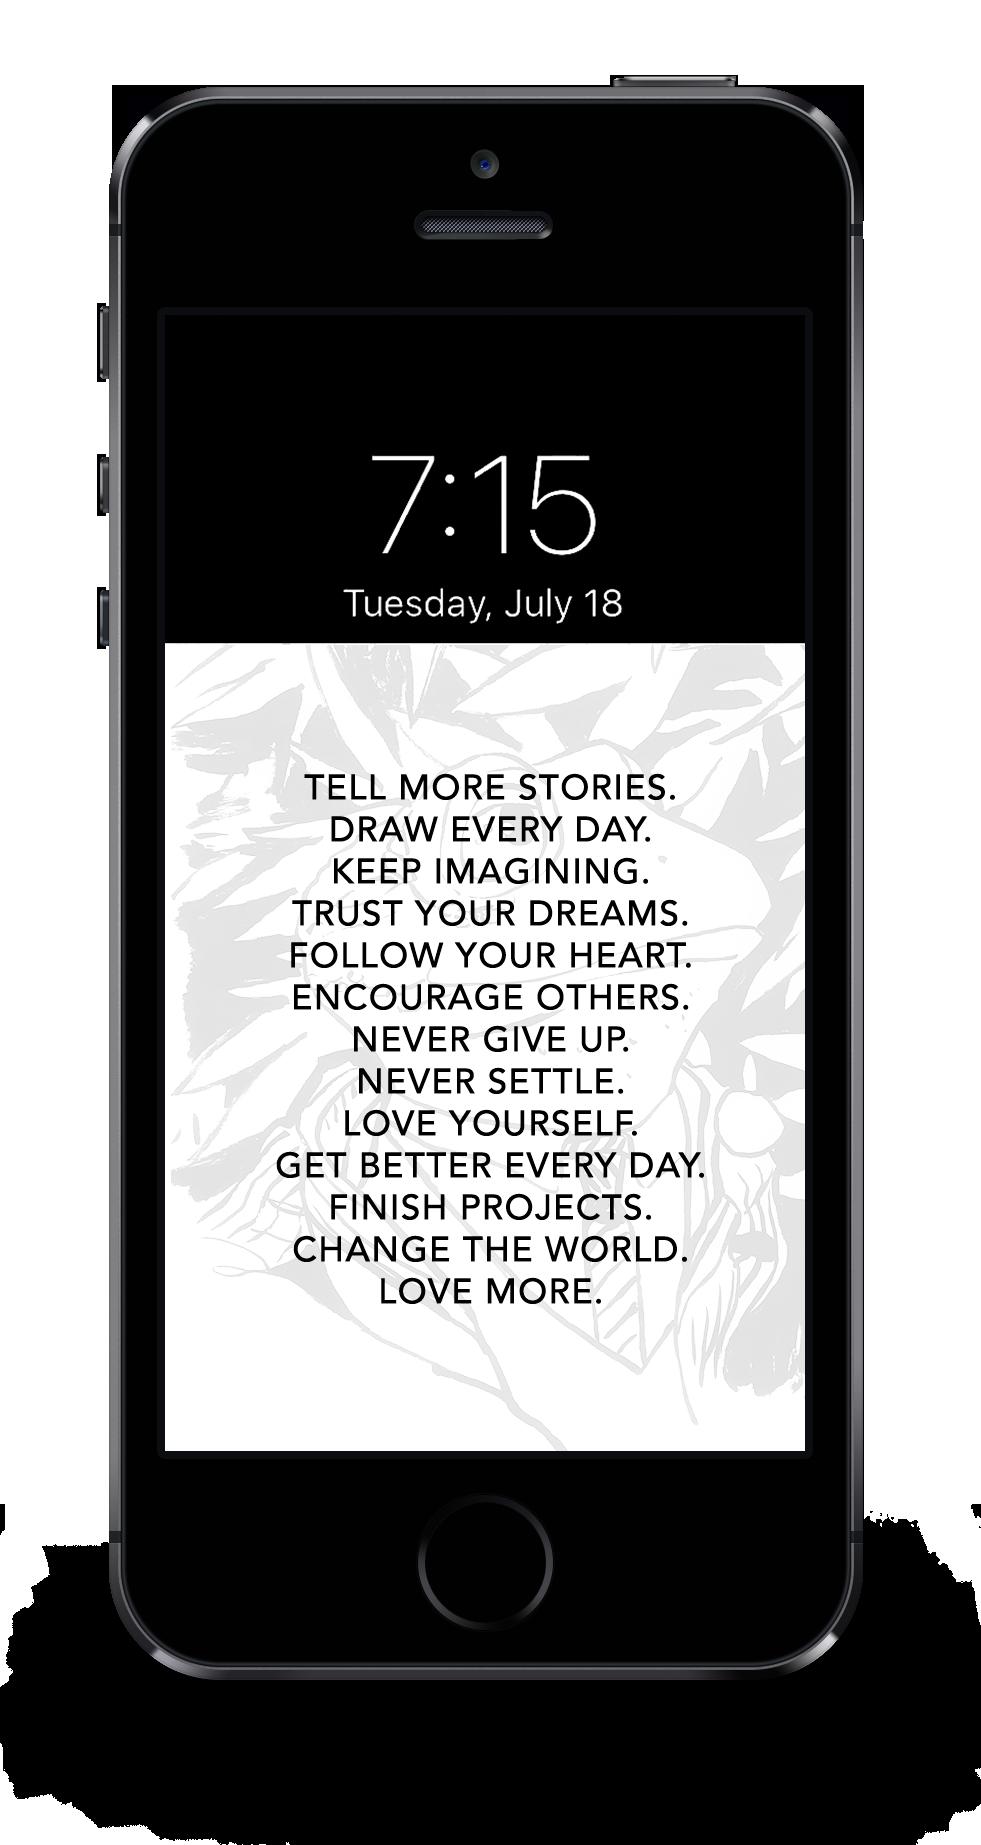 iPhone-5S-3-colors-Mock-up copy.png